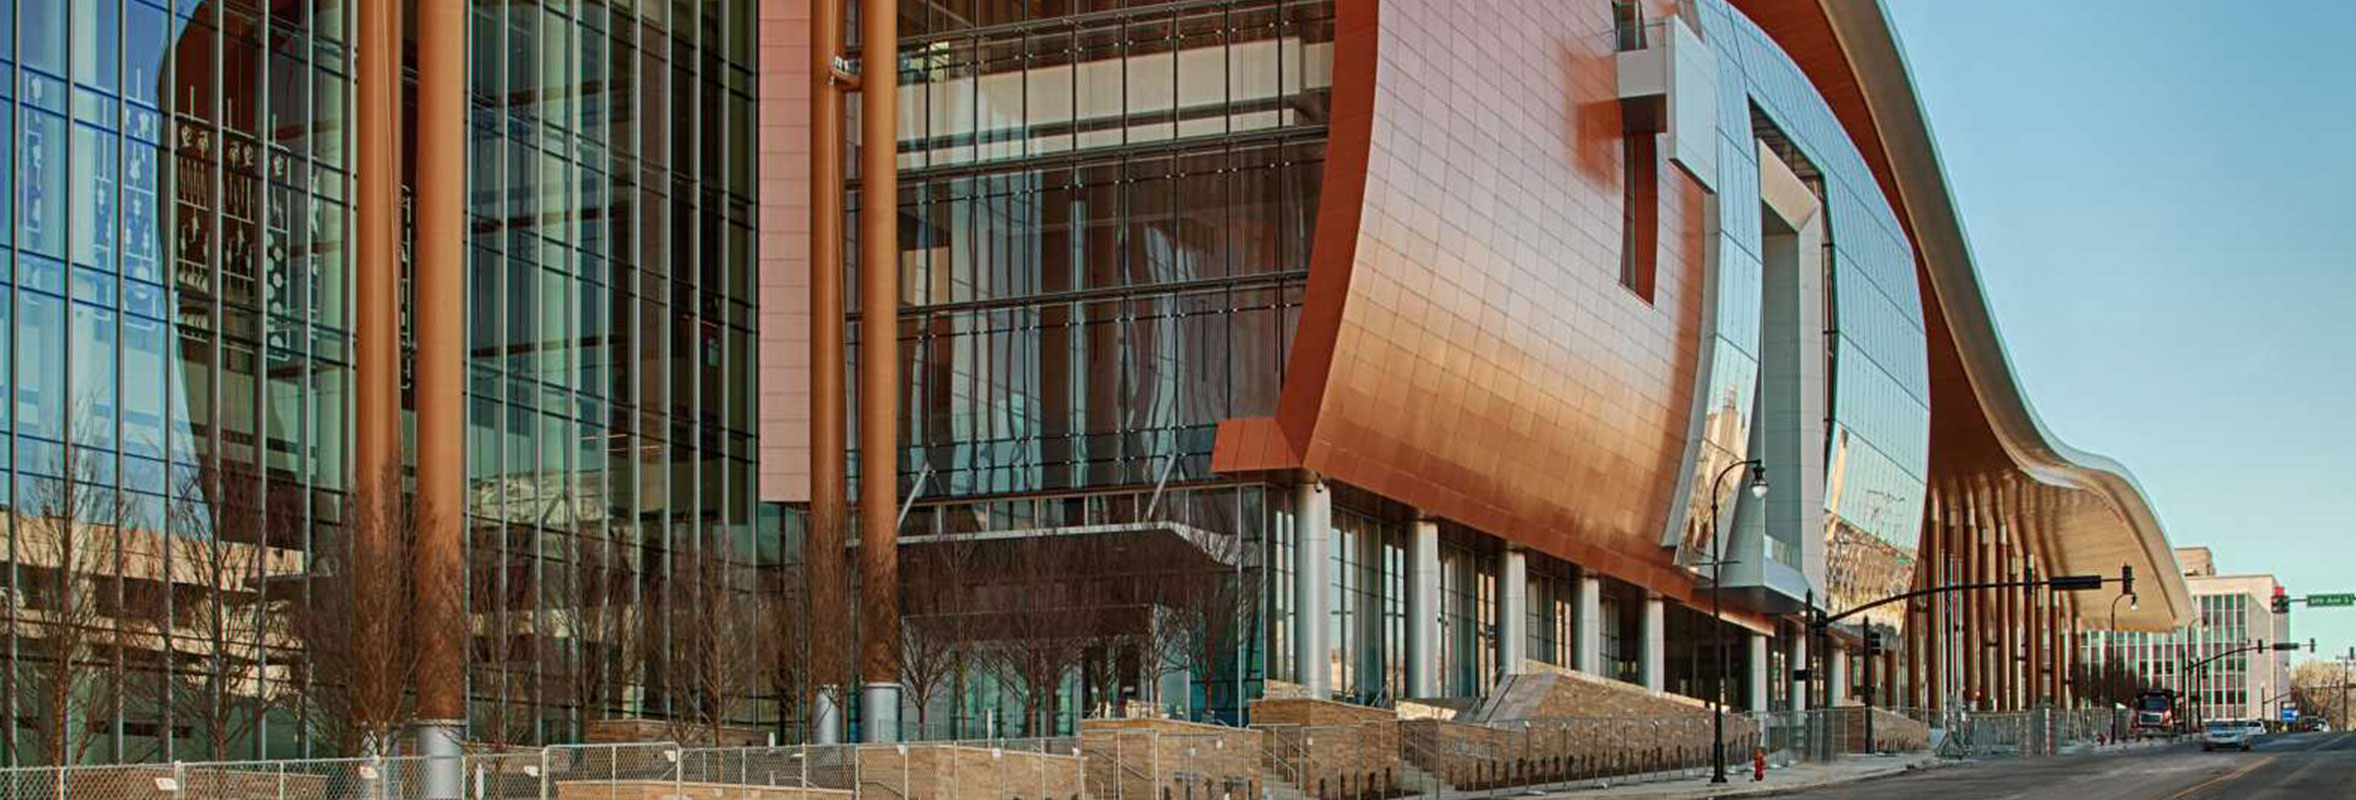 Music-City-Center_Exterior.jpg